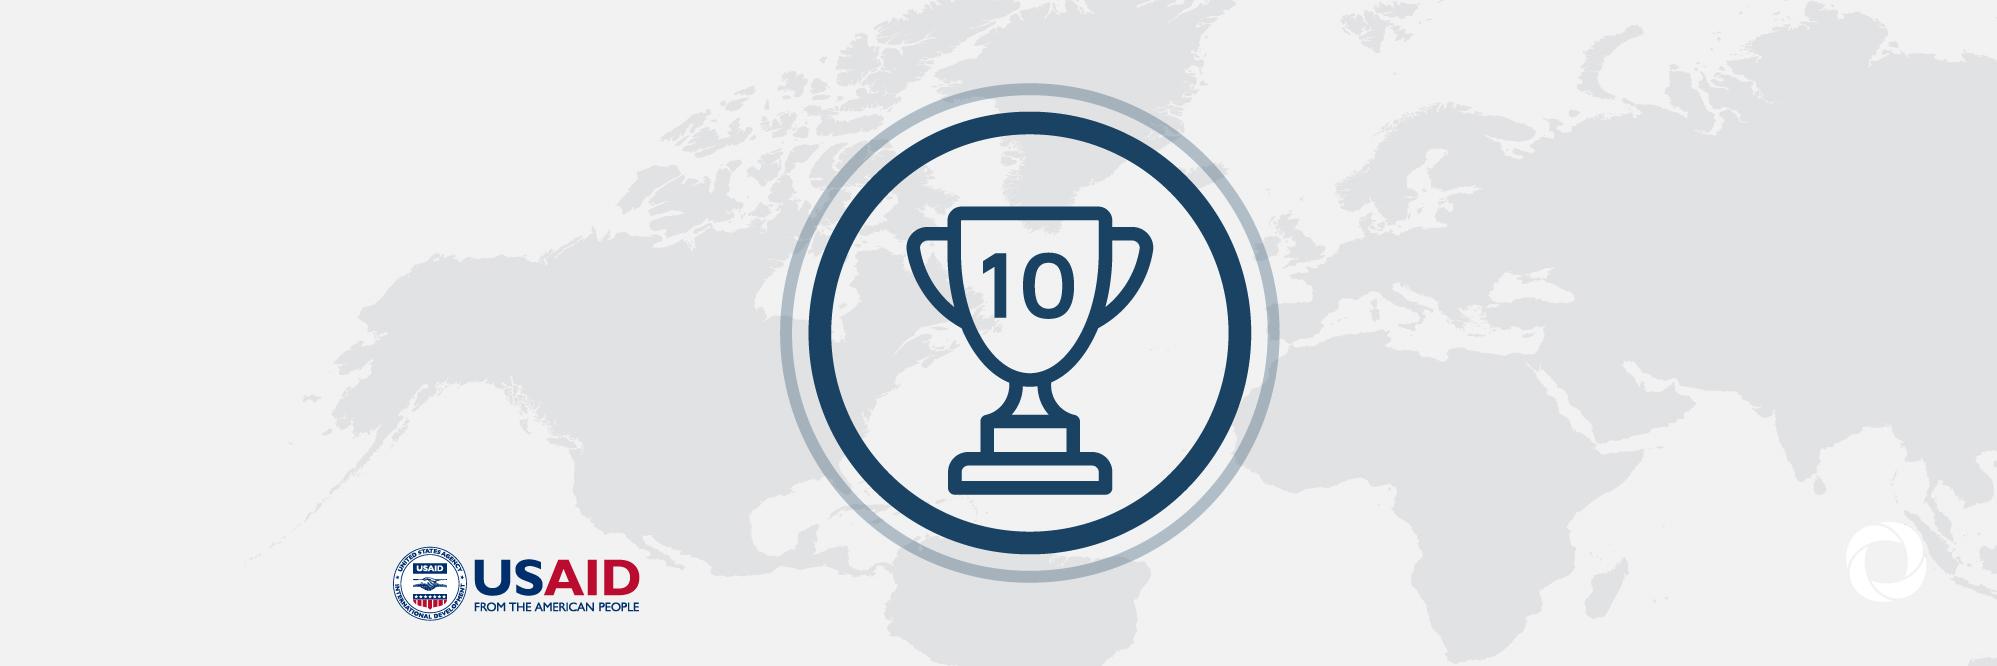 Top 10 Usaid Awardees Developmentaid